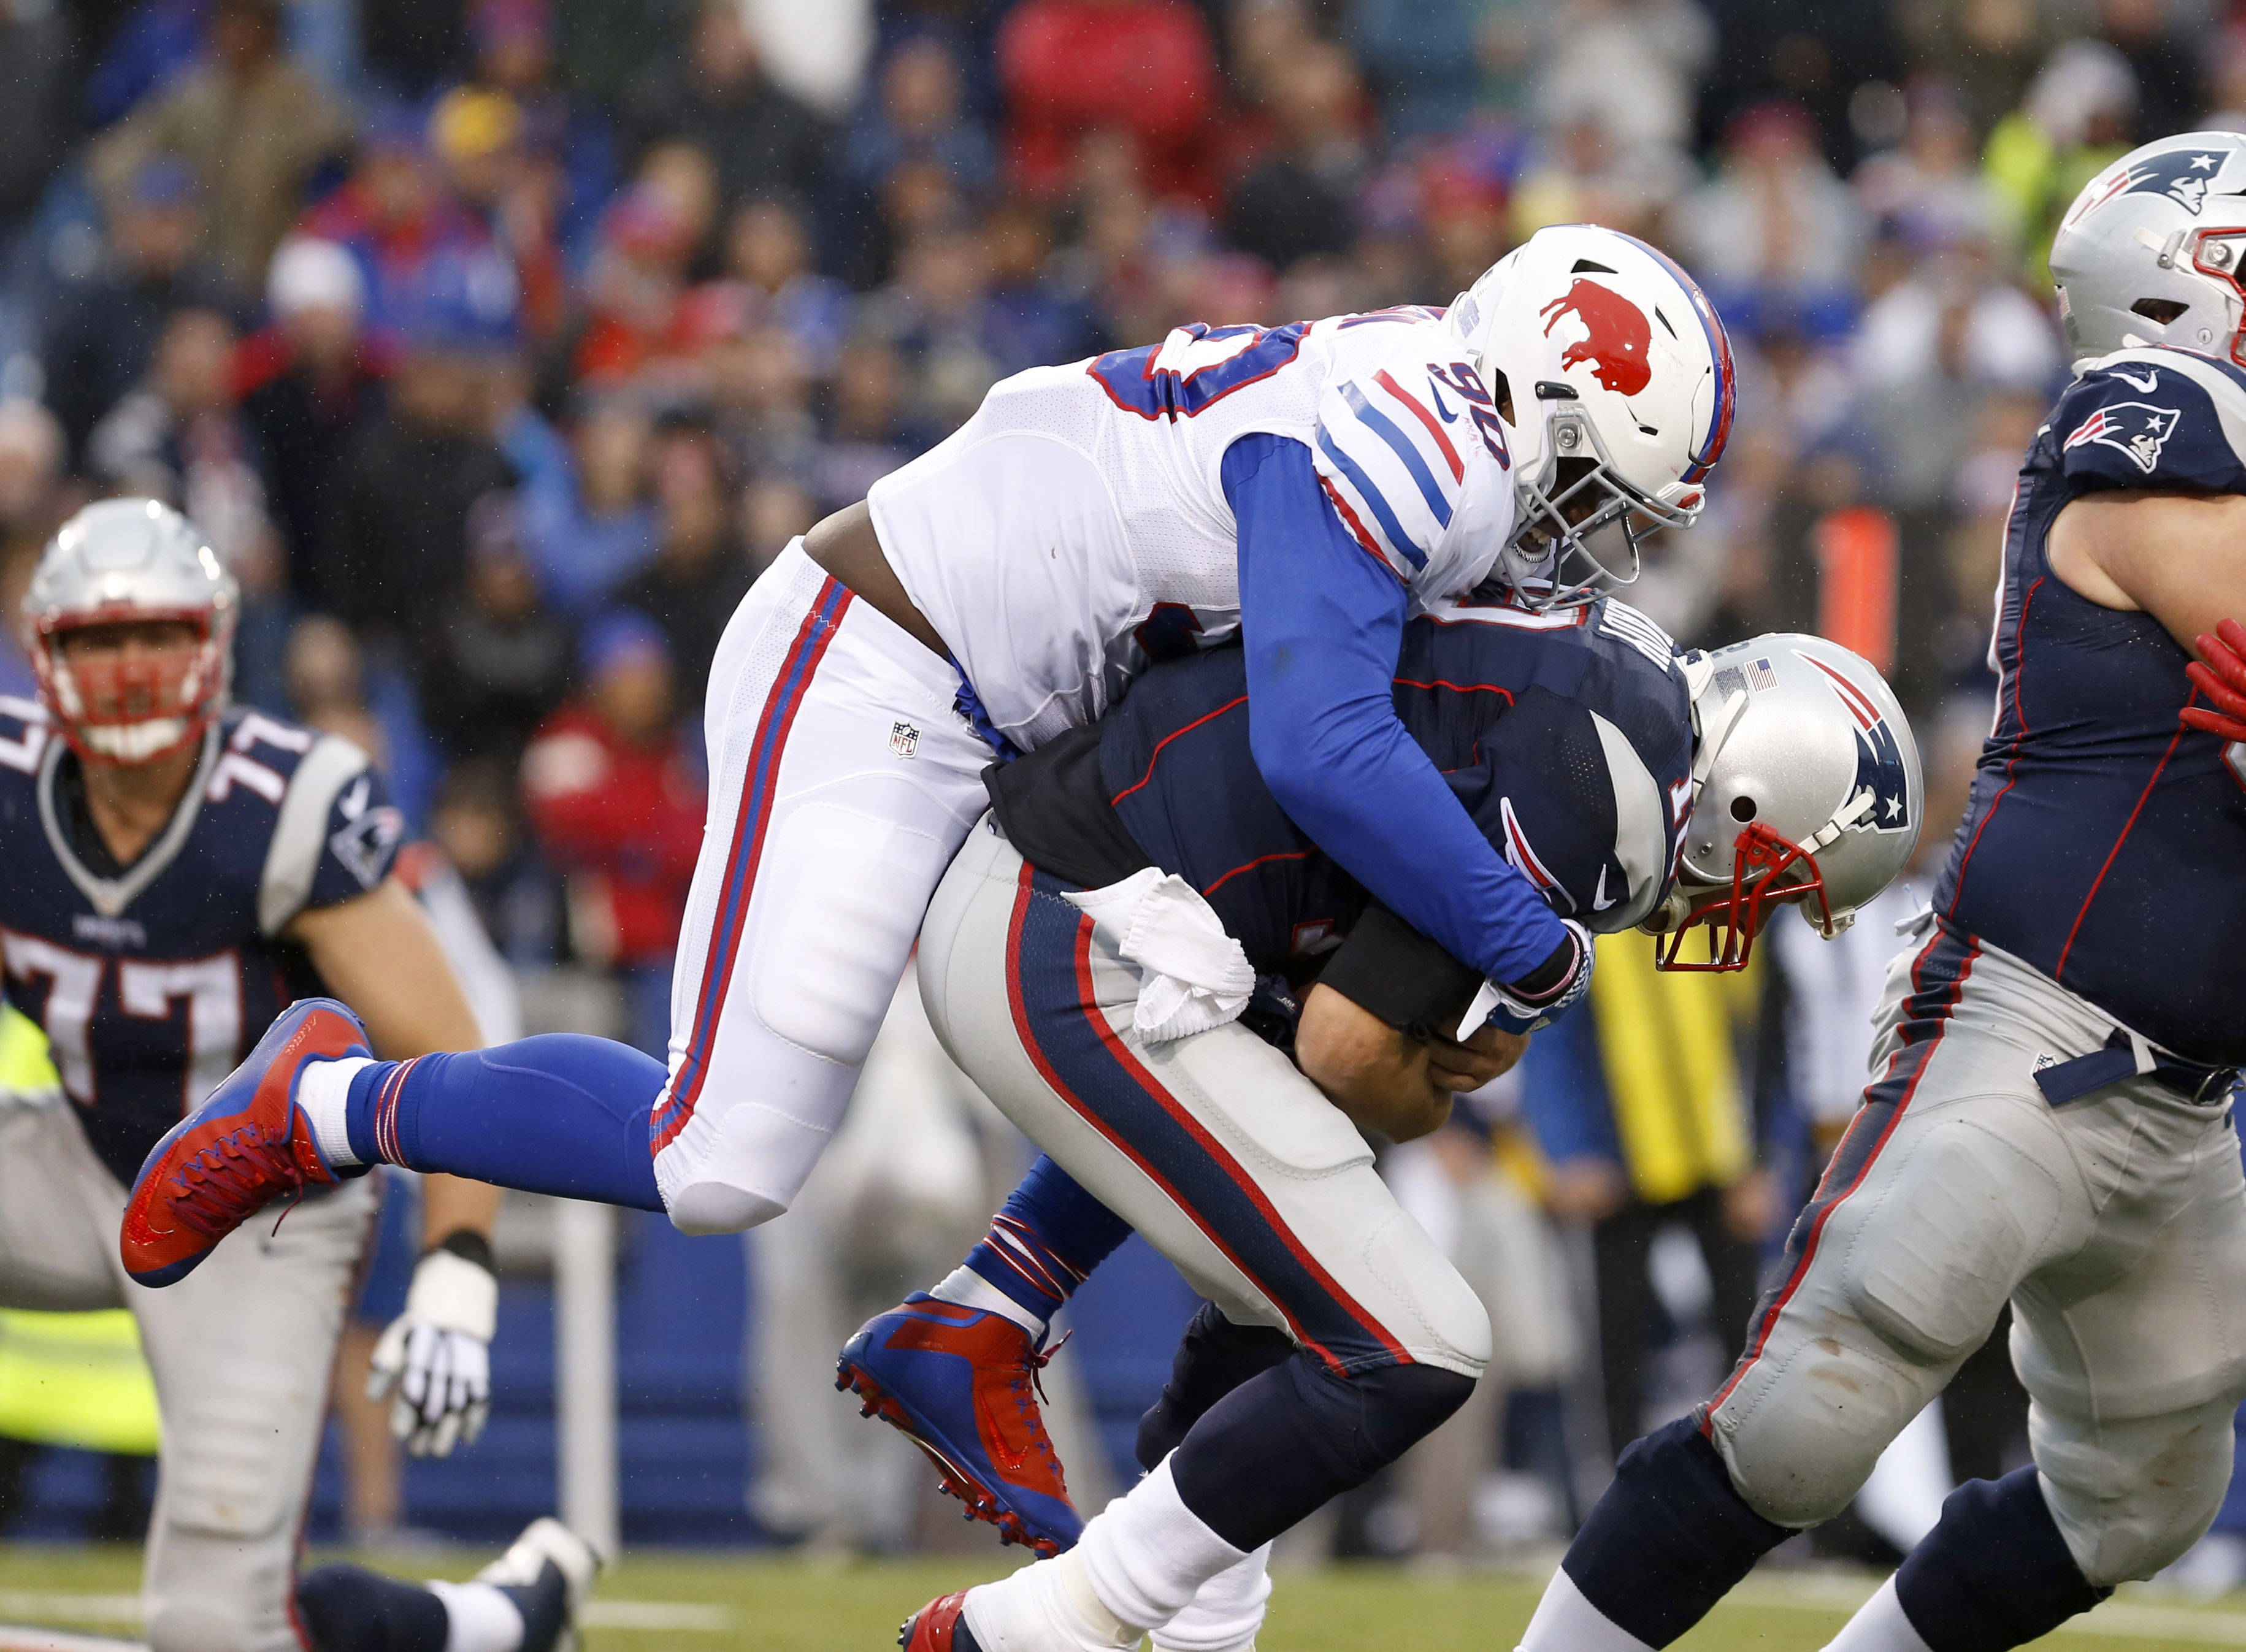 Jay Skurski: 3 Bills thoughts, Sammy Watkins edition